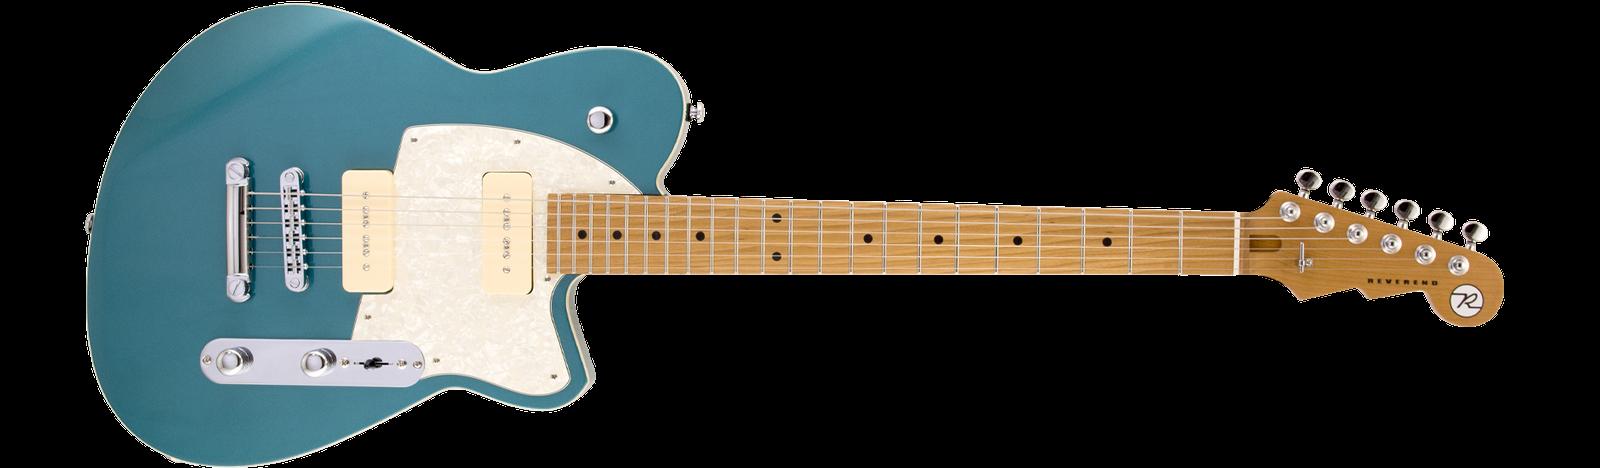 Reverend Guitars Charger 290 Deep Sea Blue